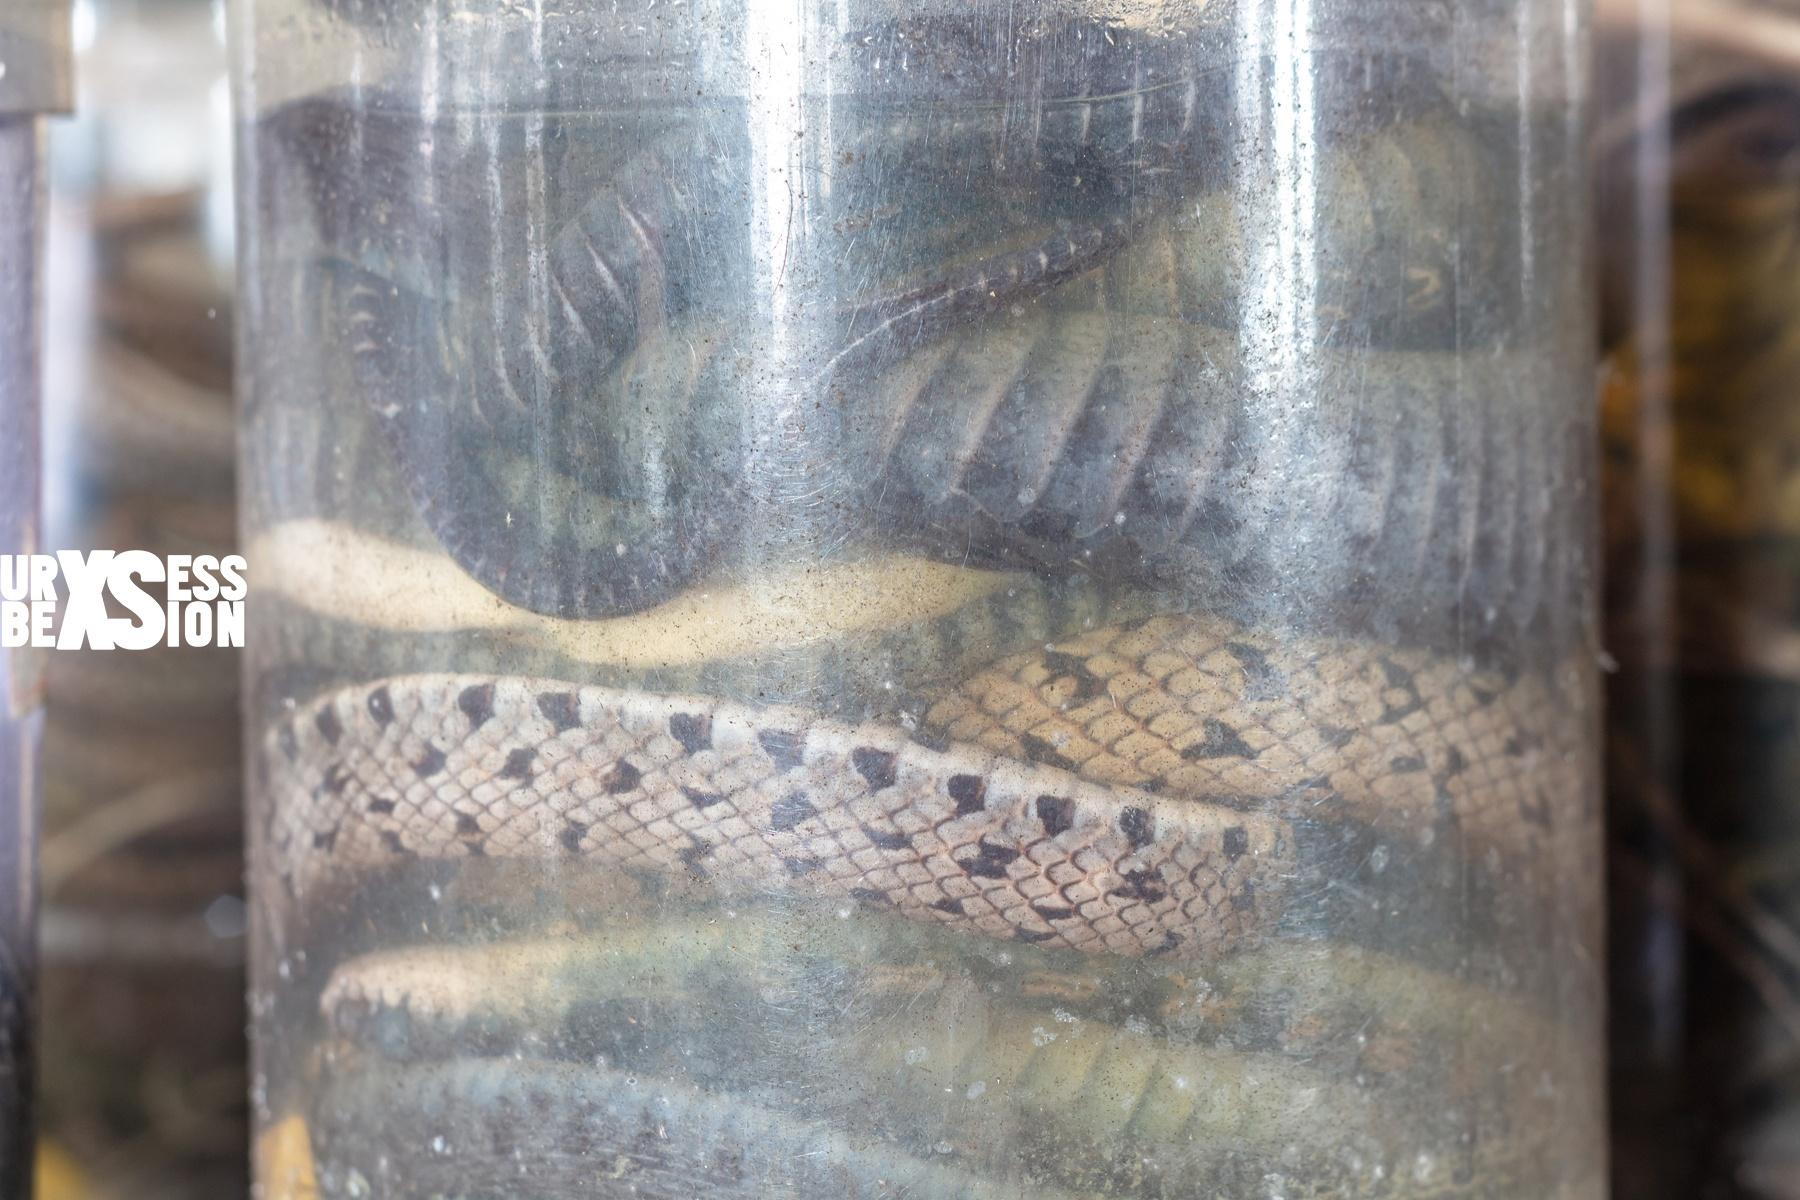 laboratoire-serpents-21